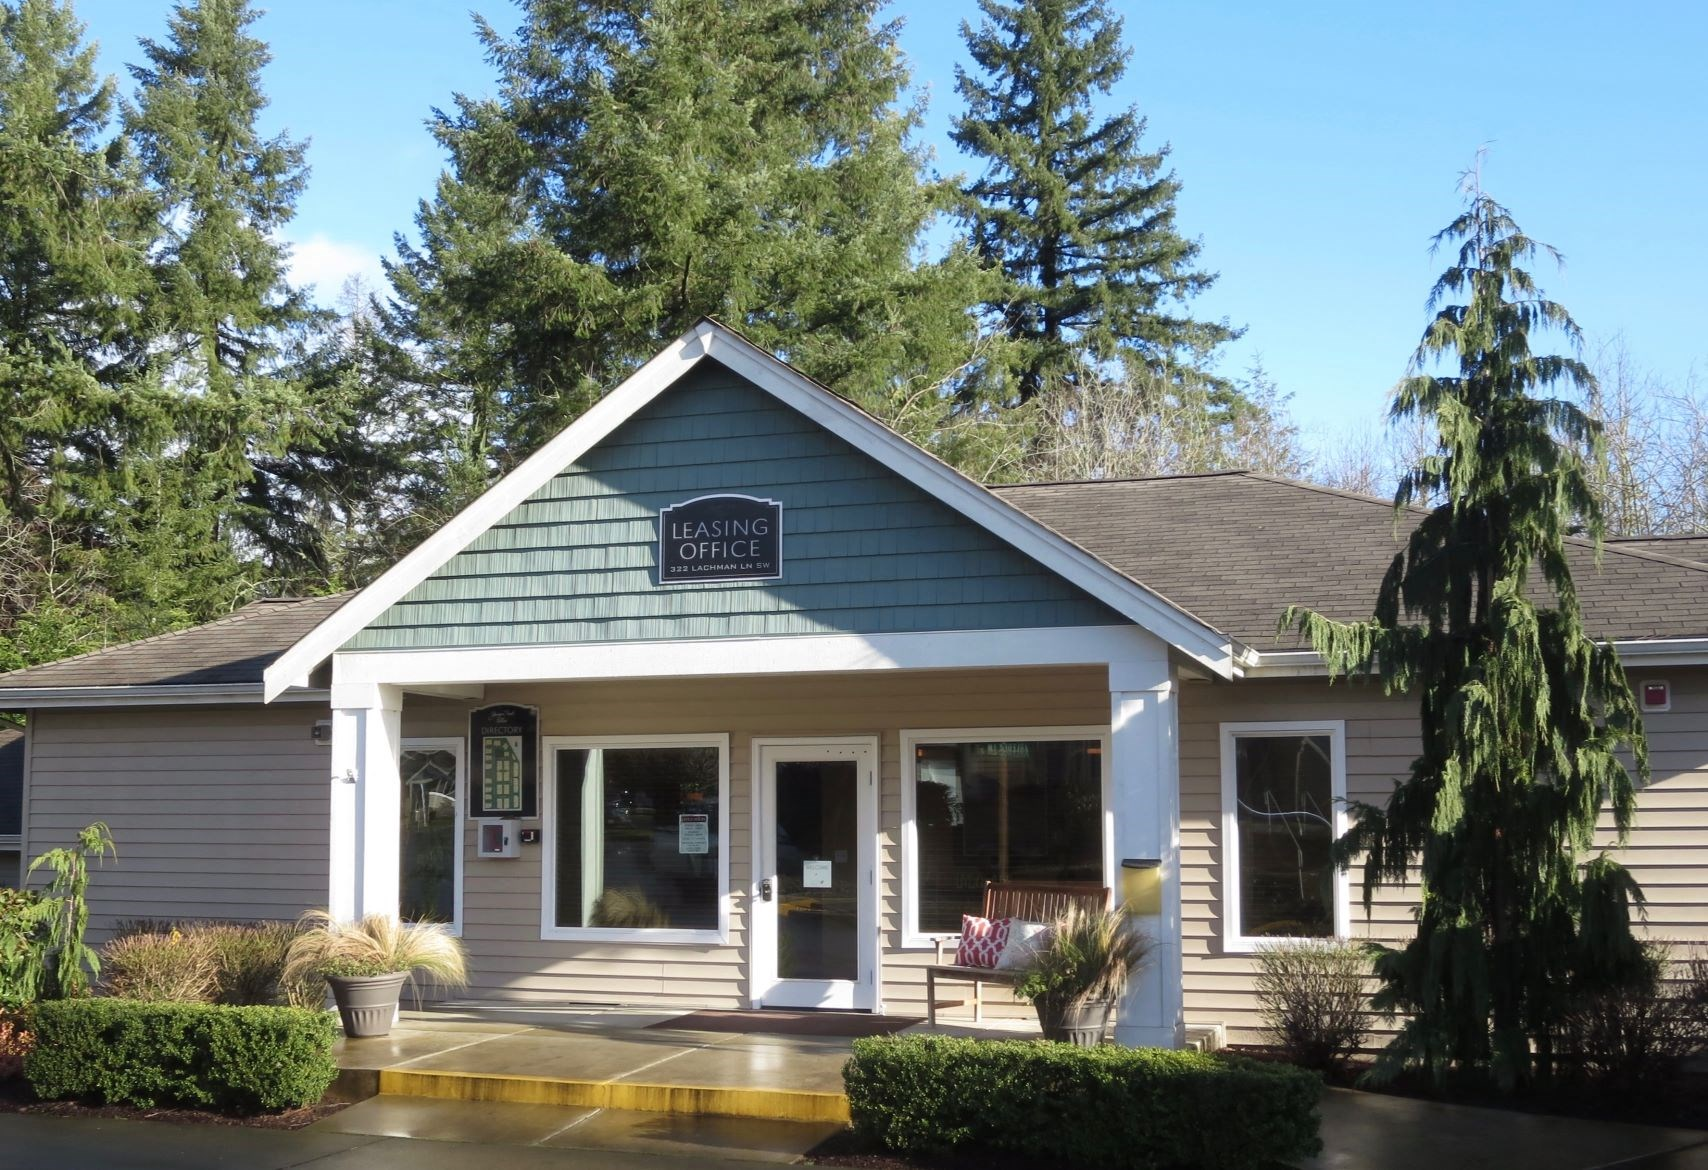 Leasing Center External View at Yauger Park Villas, Olympia, WA